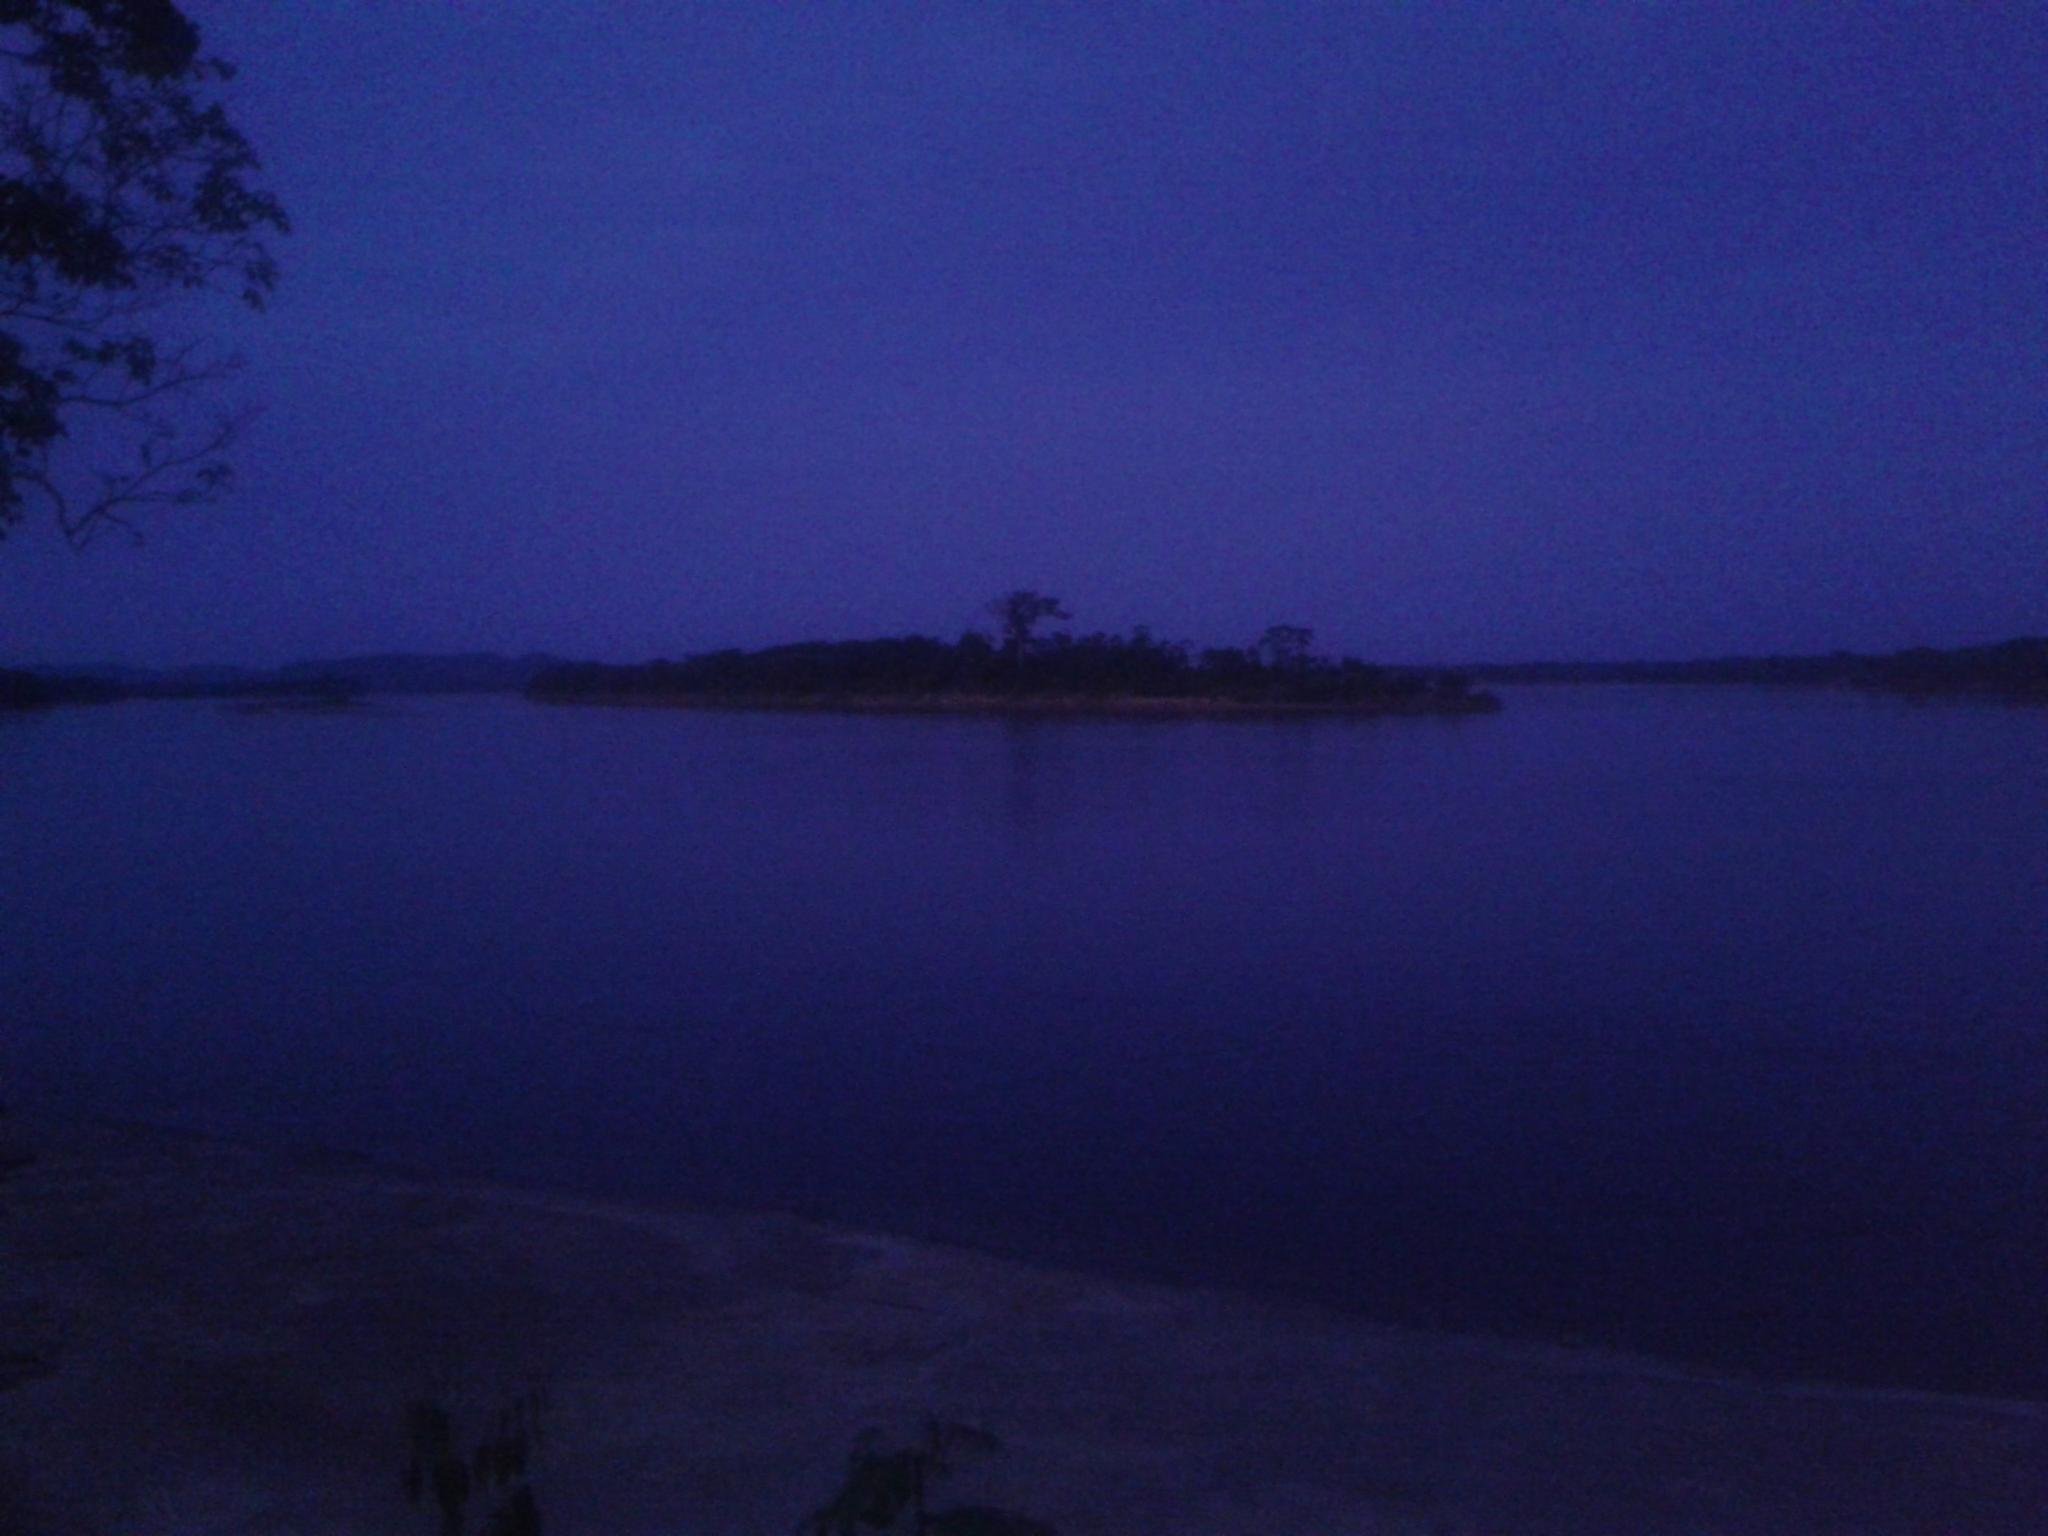 Breaking dawn at Orinoco River by FRANTREM